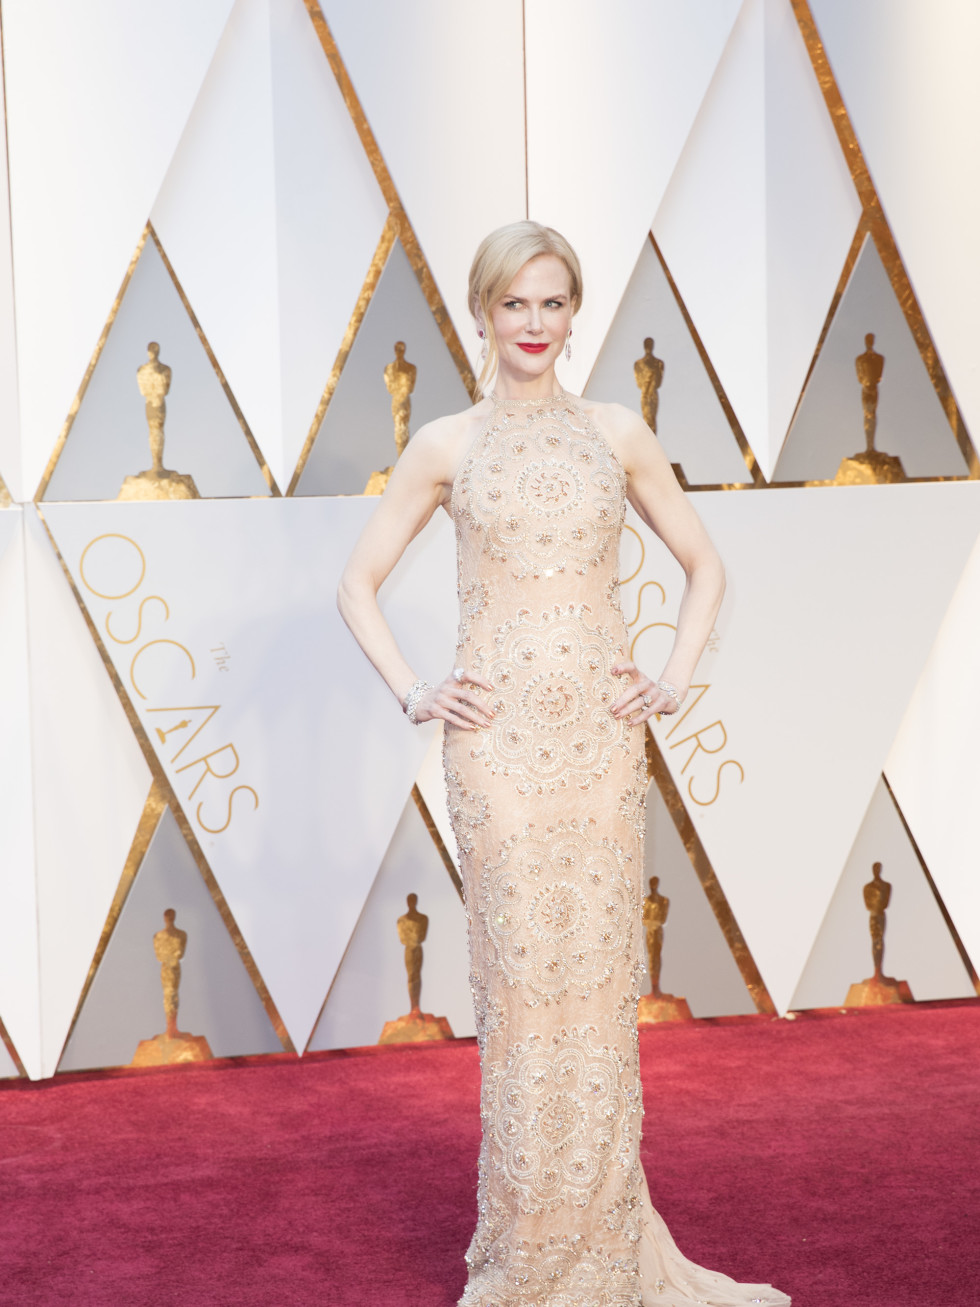 Nicole Kidman at Oscars 2017 in Armani Prive